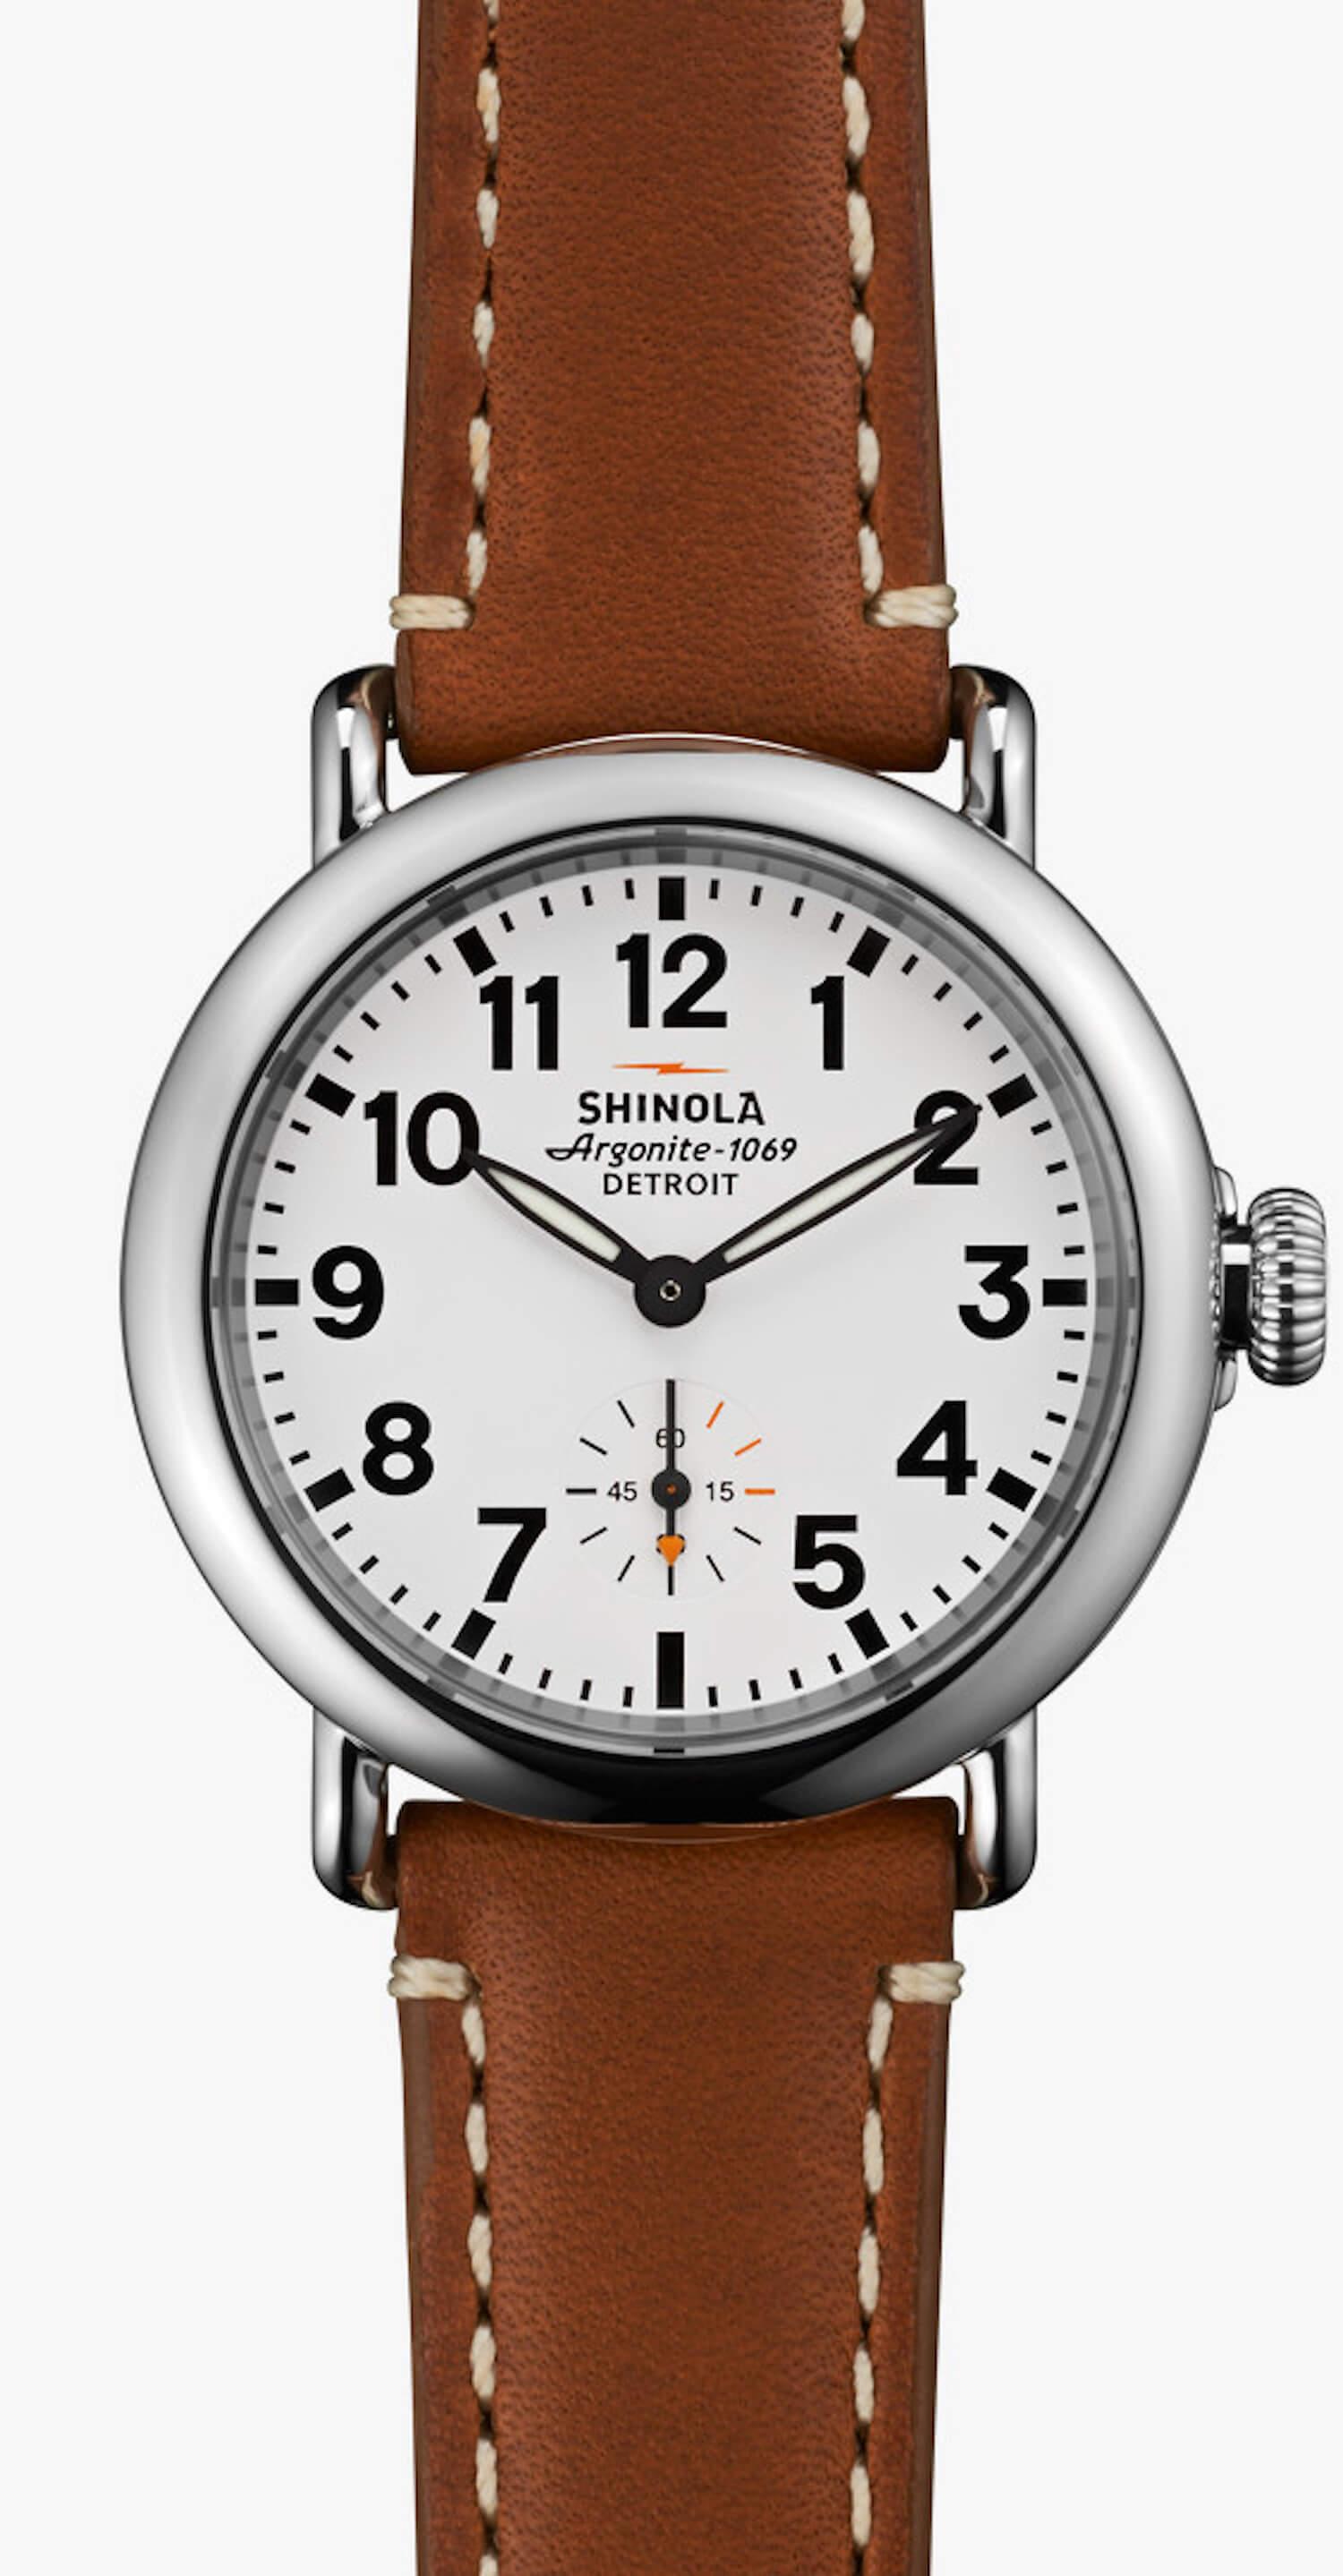 Shinola Watch   Karina Calvert Jones Gift Guide   Gift Guide